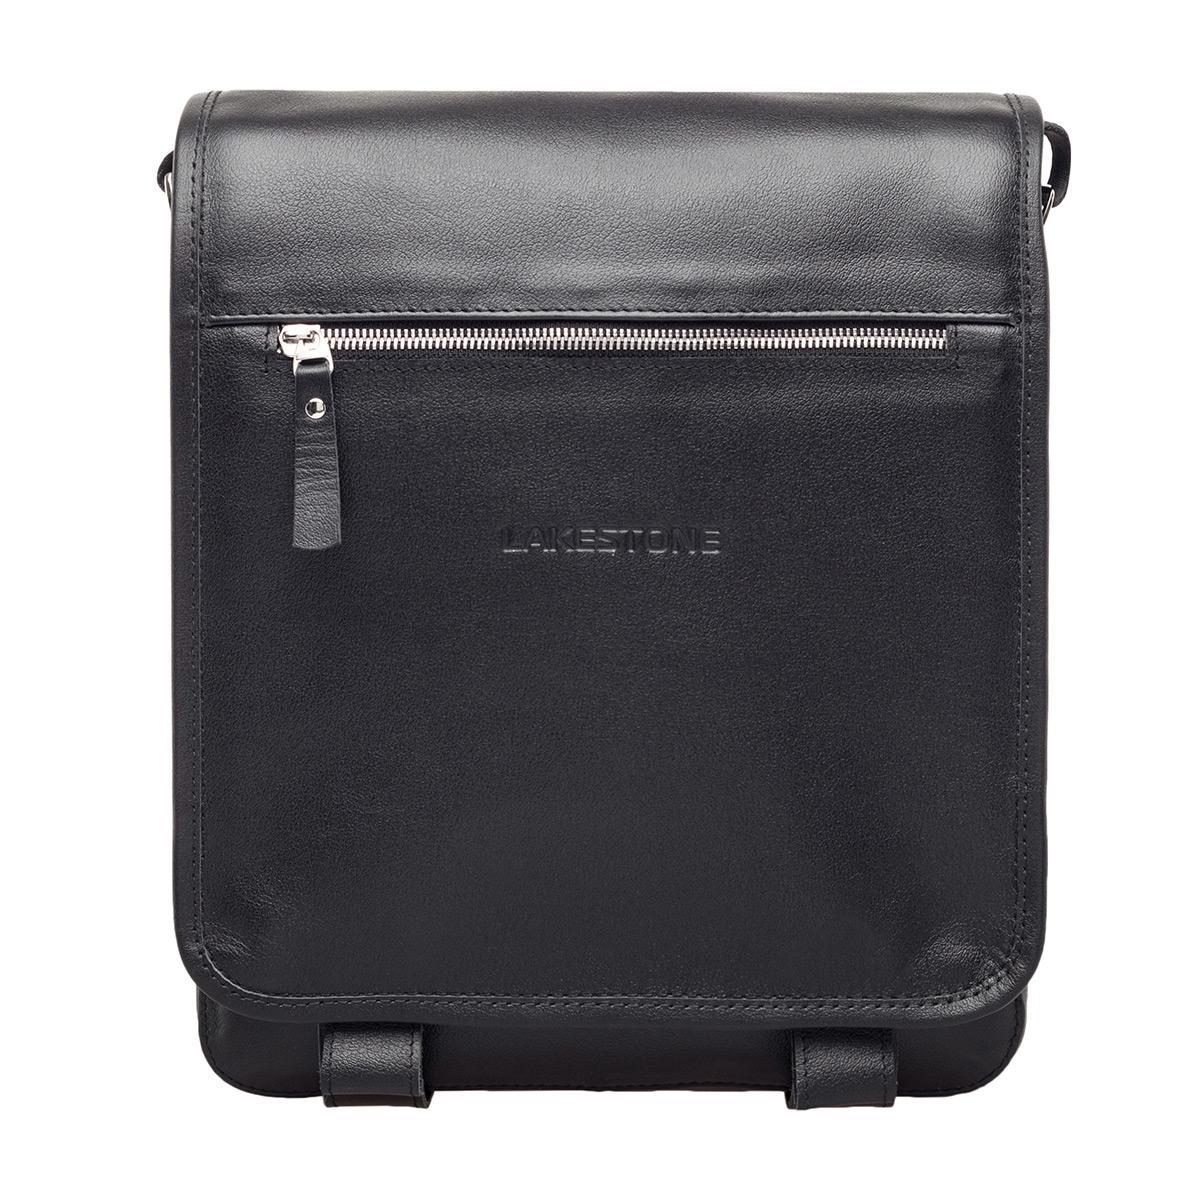 Мужская сумка через плечо Denston Black фото